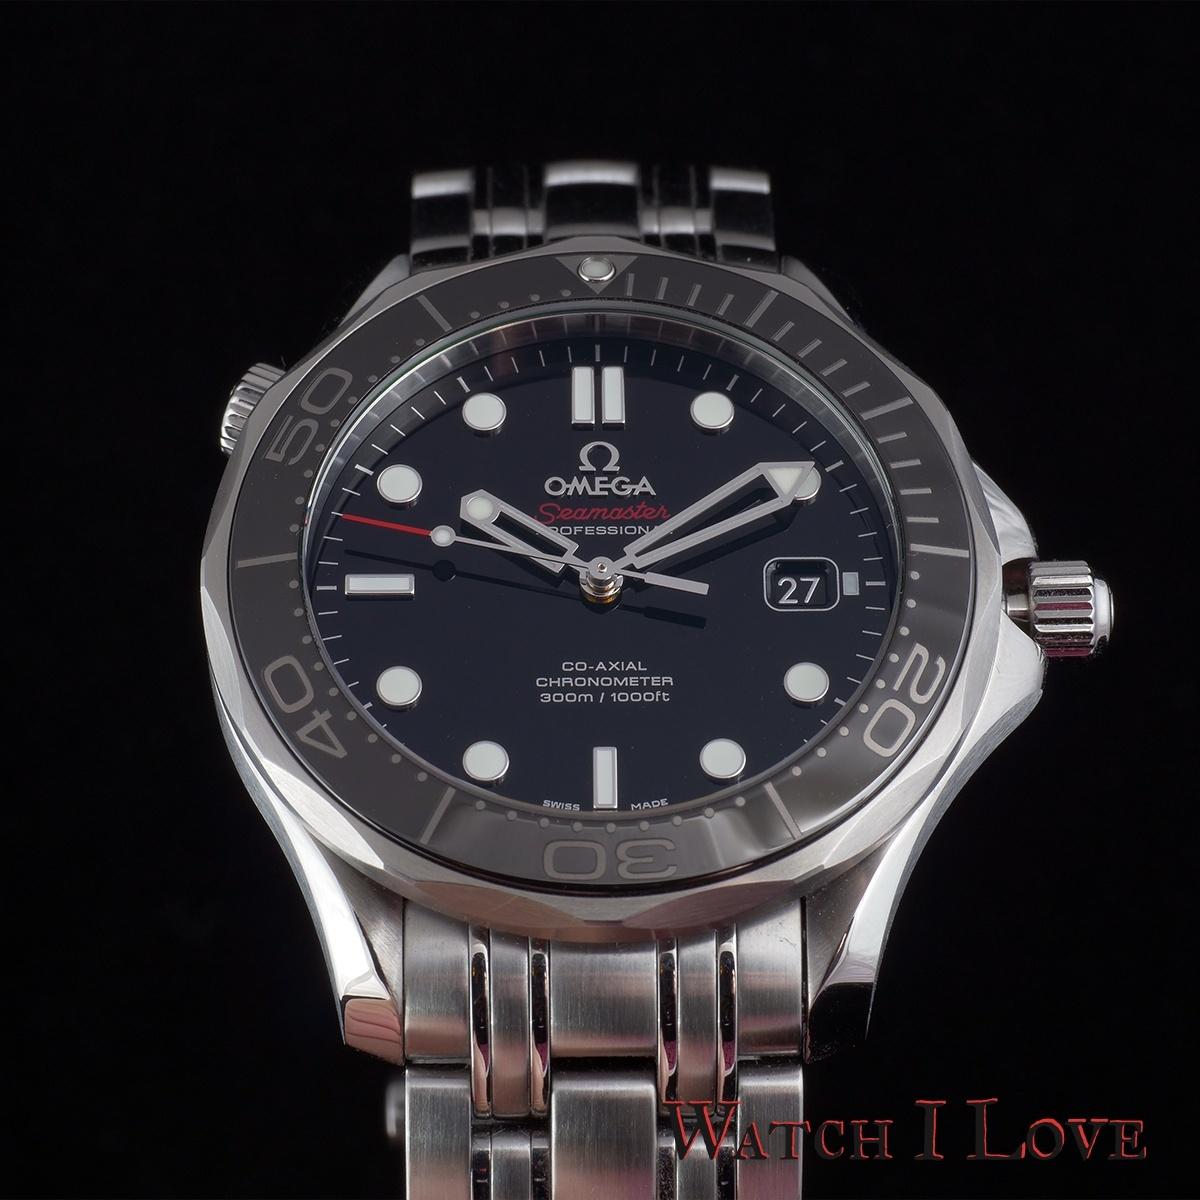 Omega Semaster Professional Diver 300m soldat